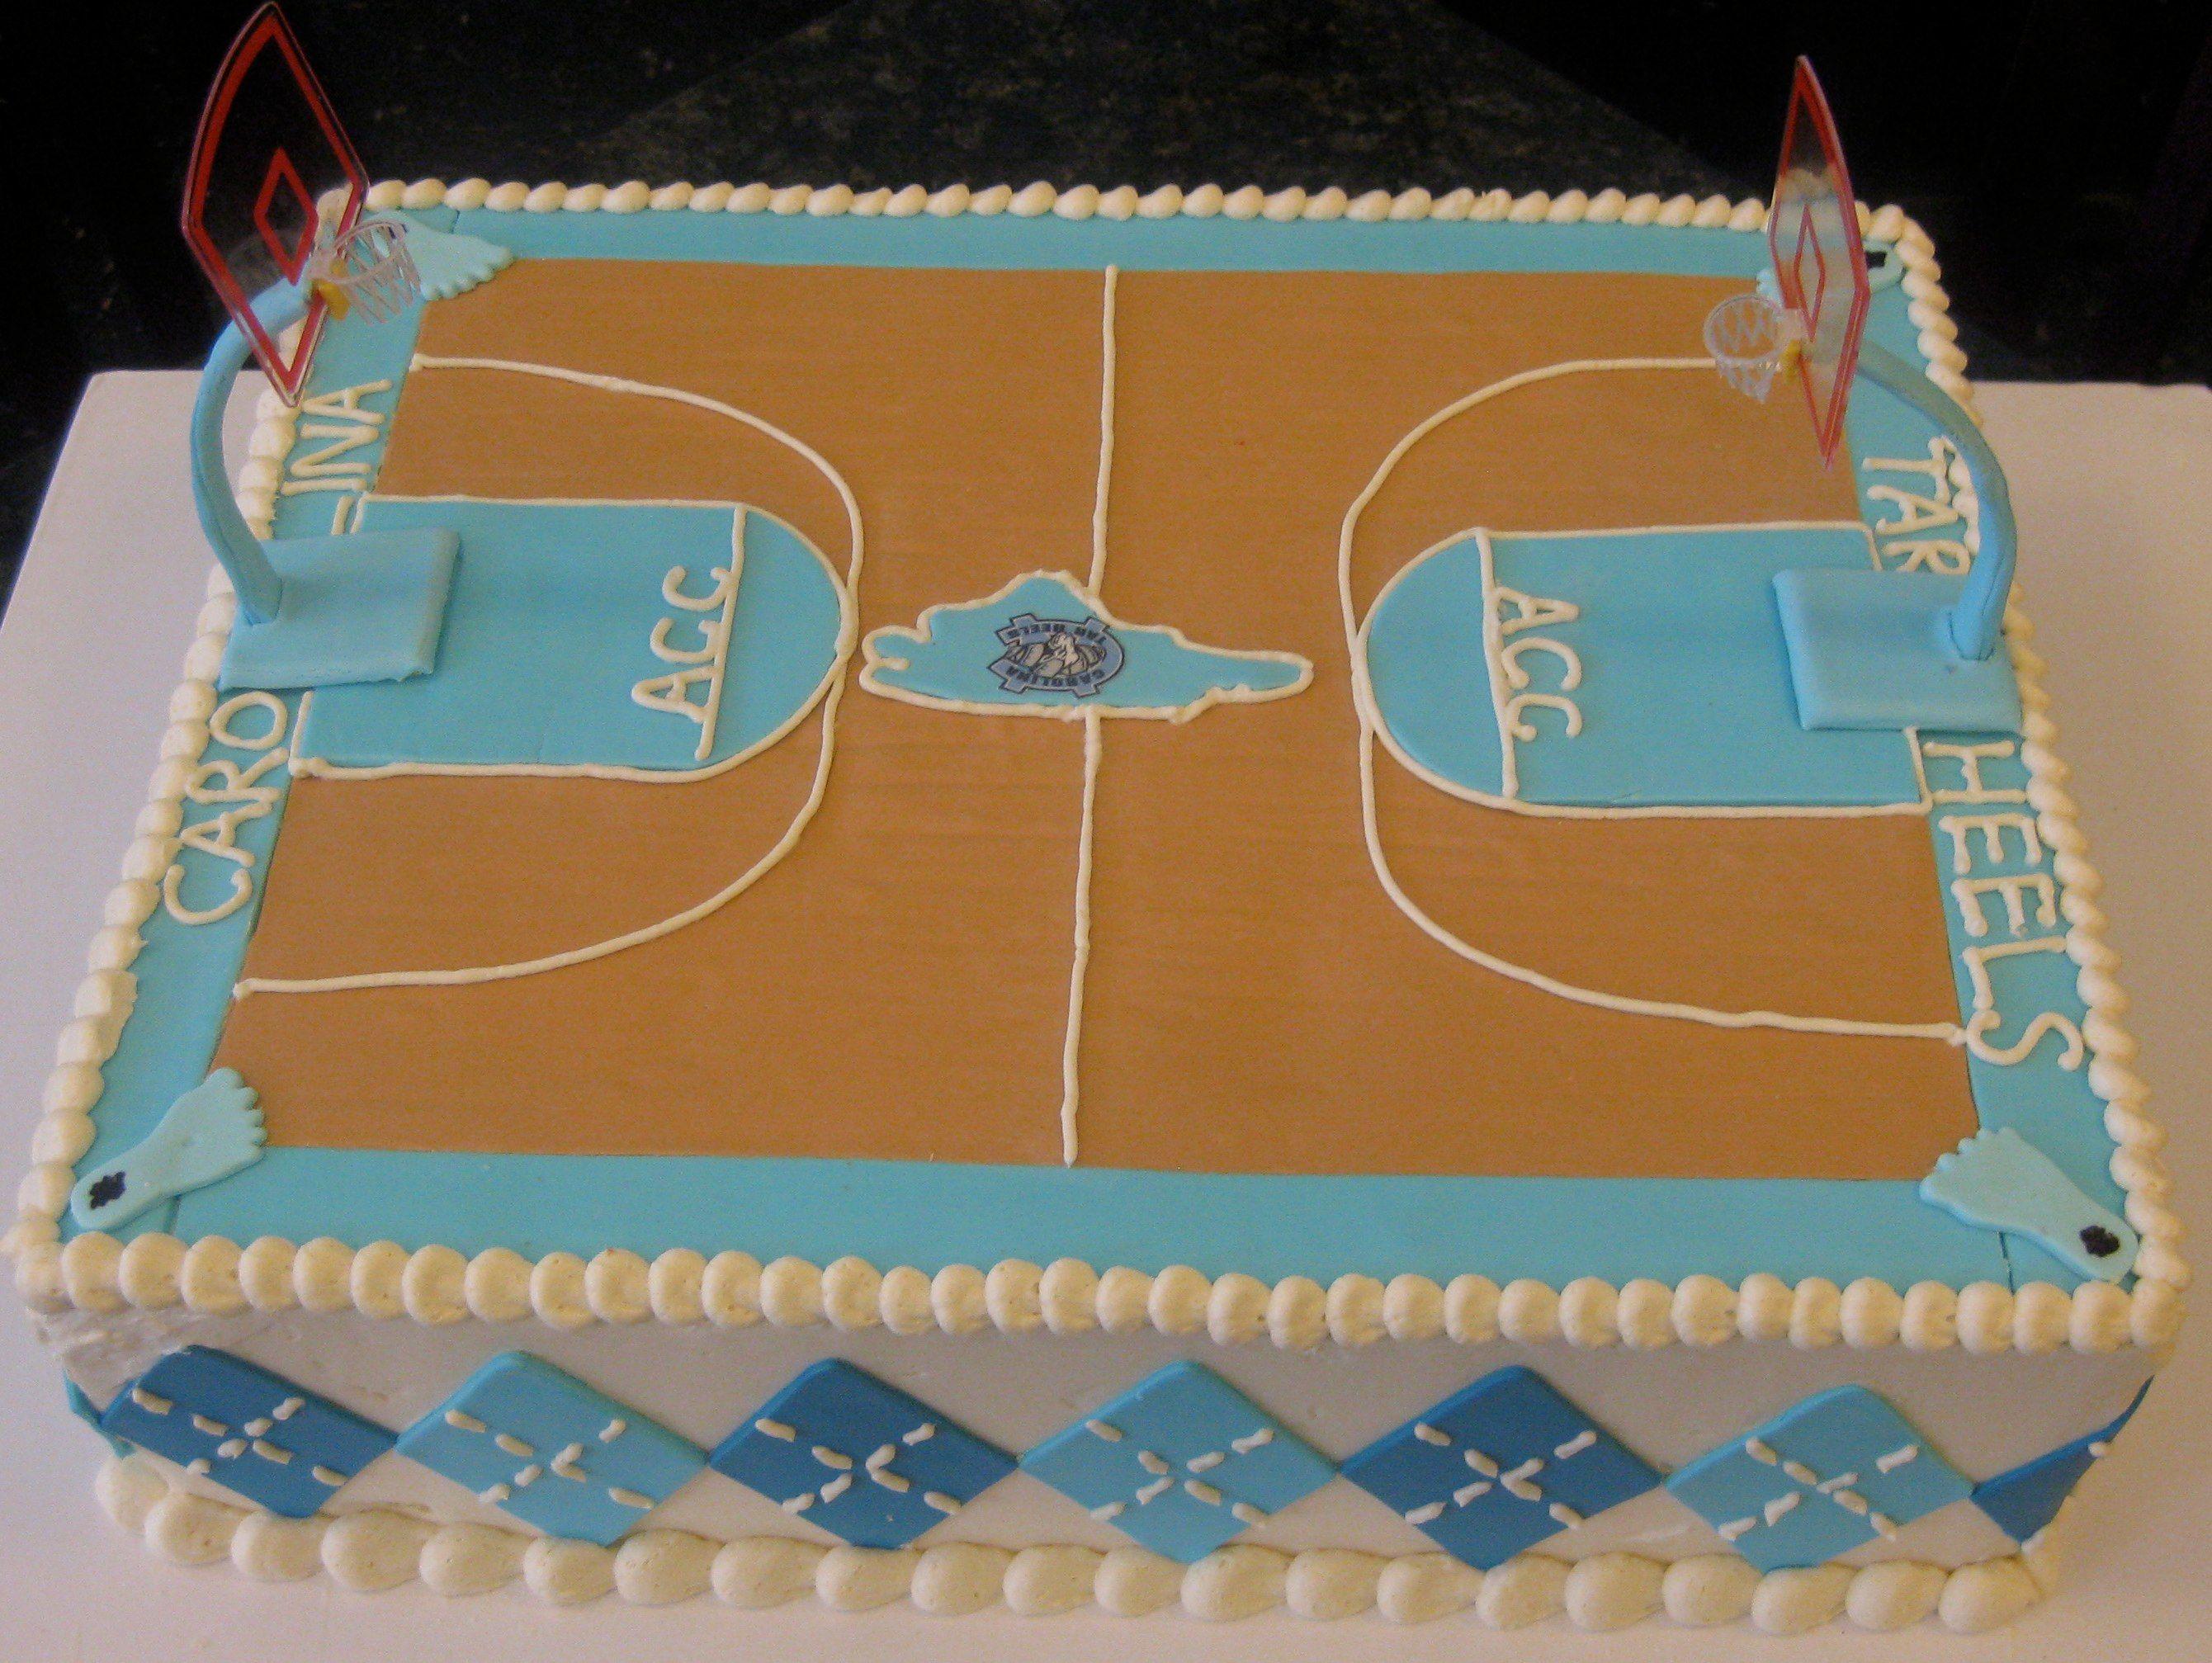 Carolina Basketball Cake Fun Cakes Pinterest Cake Boy cakes